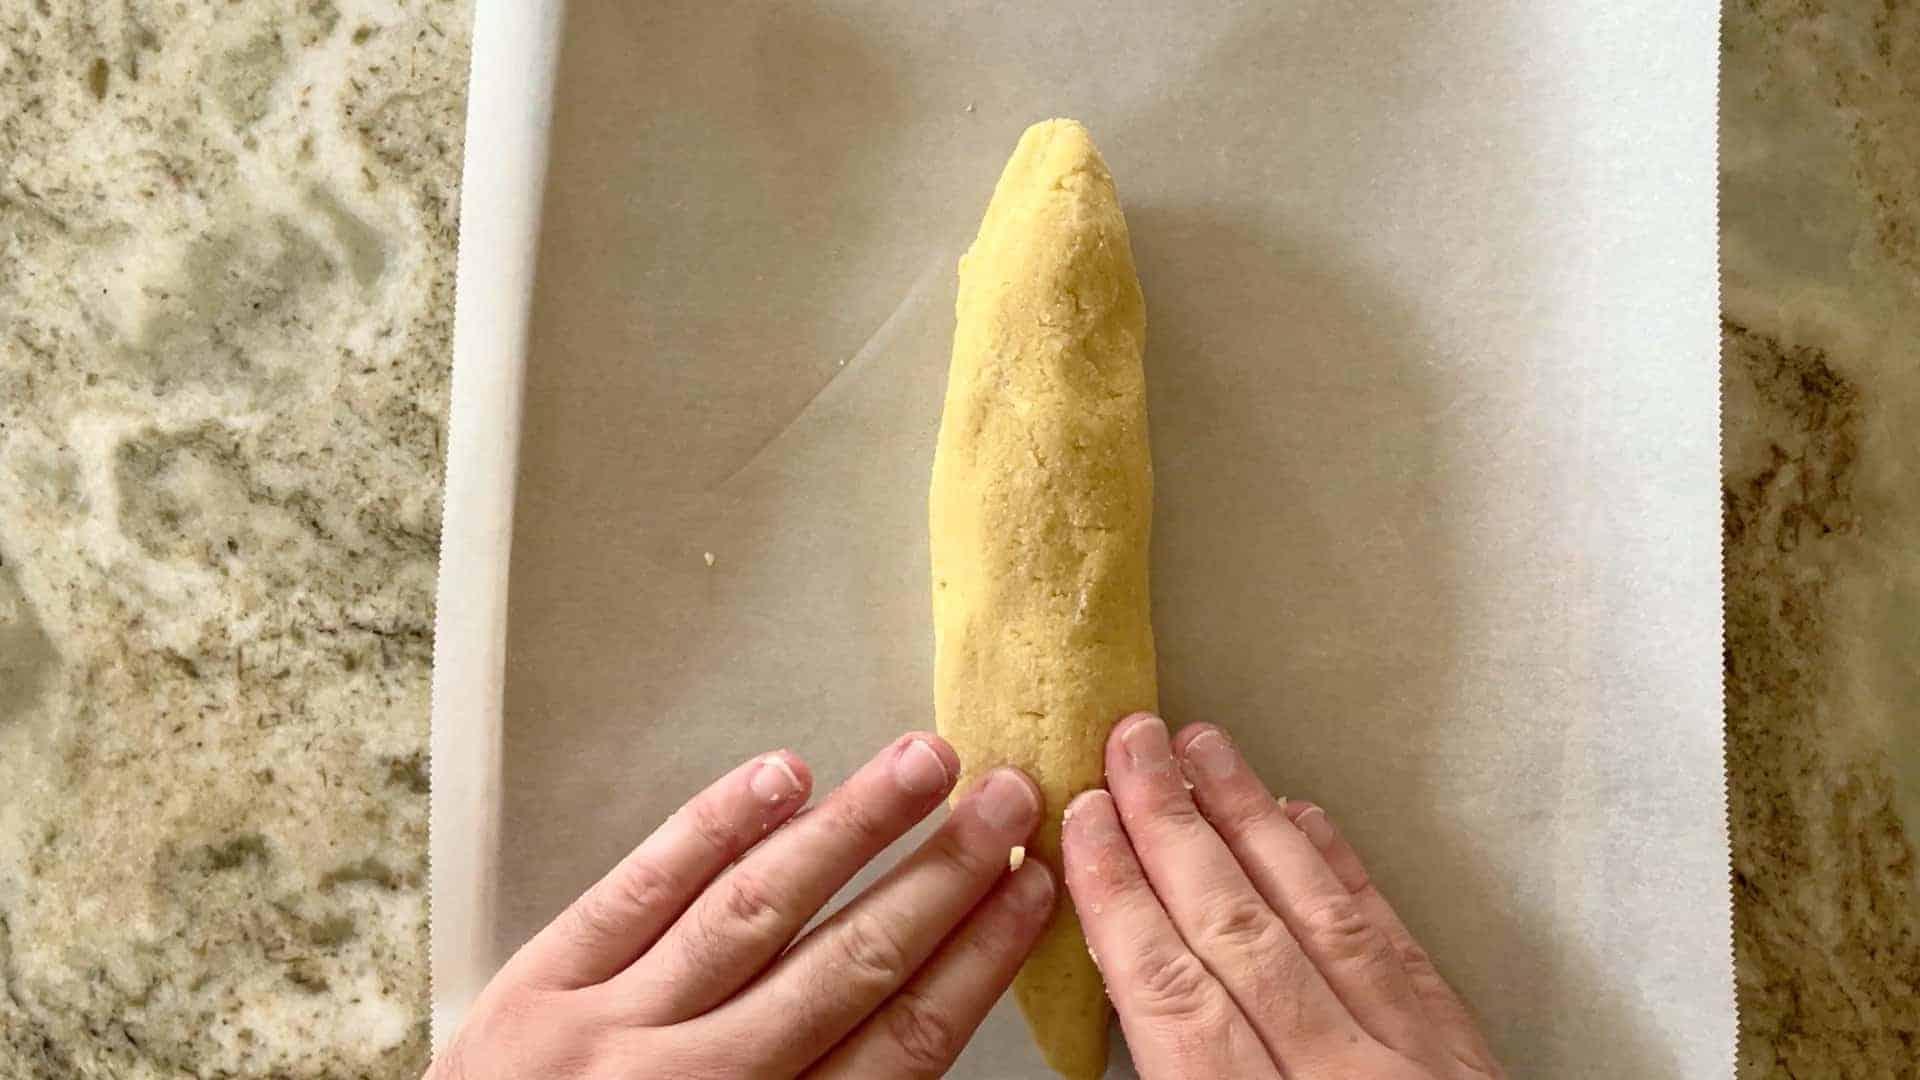 shaping the baguette dough on the baking sheet